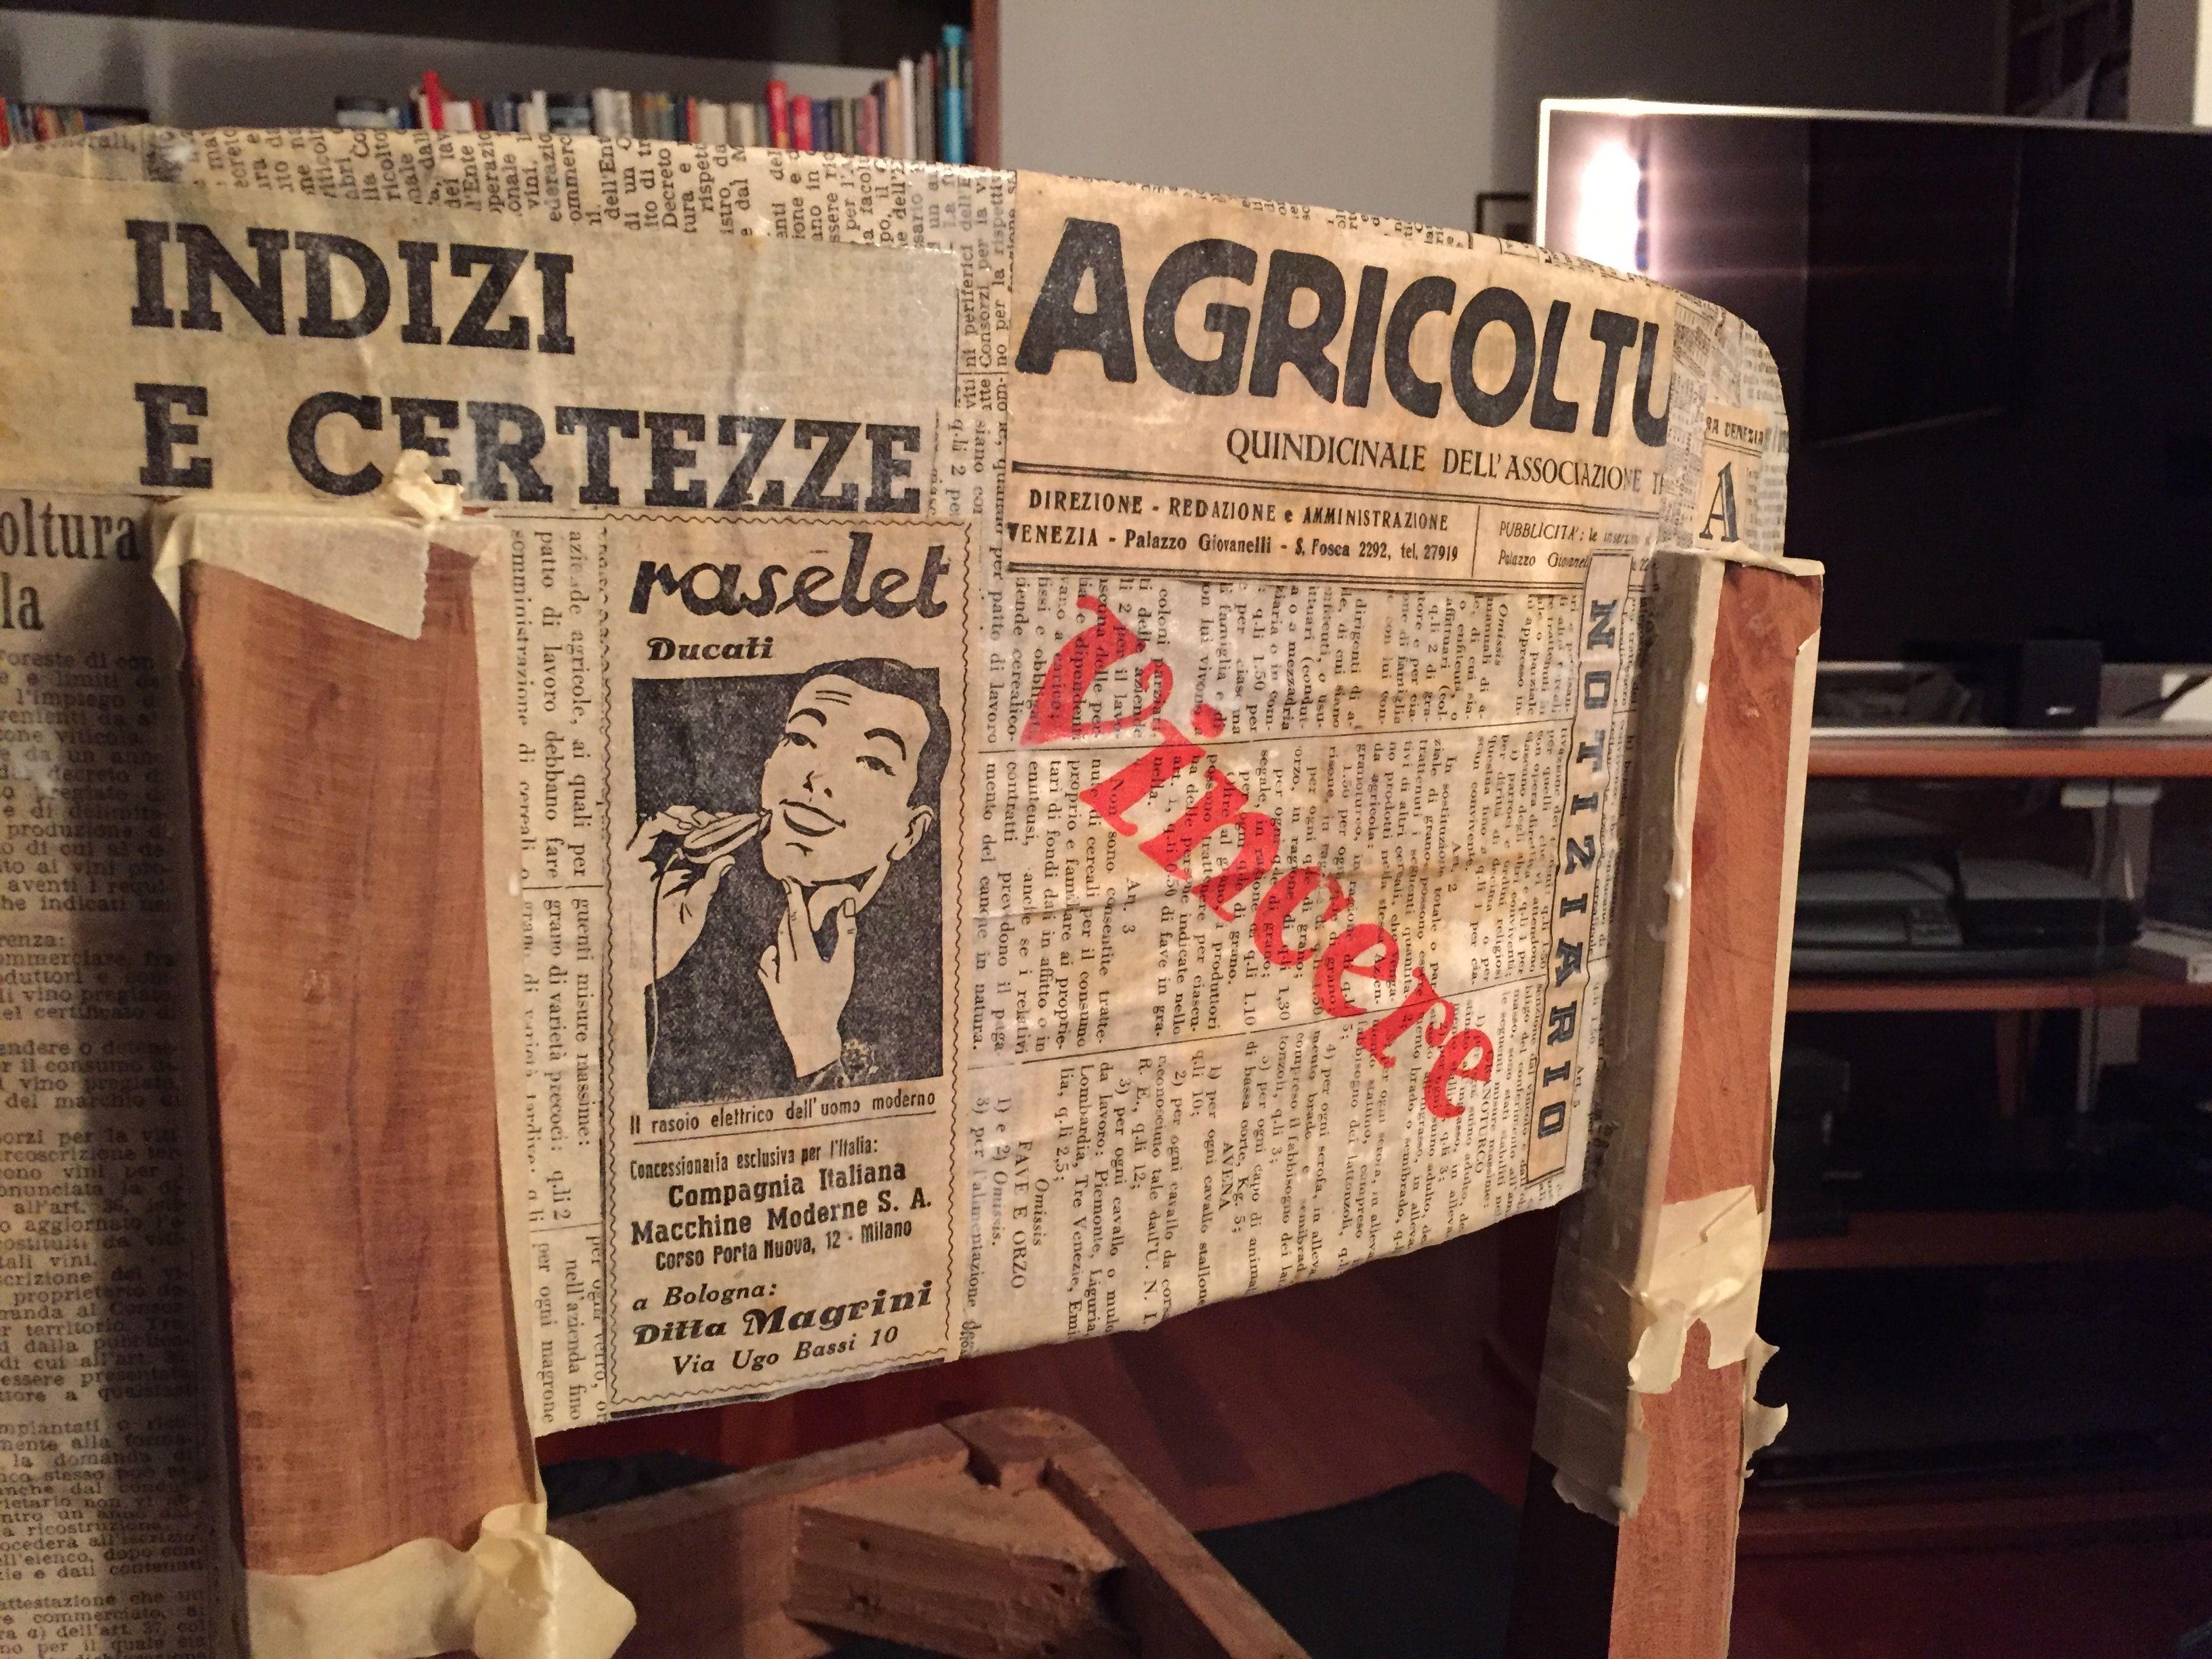 Non vale più di VALE! GO VALE GOOOO!!!! #vr46 #iostoconvale @lato_venezia #design #paper #wood #legno #instapic #picoftheday #table #chair #font #newspaper #old #vintage #madeinitaly #igsvenezia #igvenezia #vsco #instagram